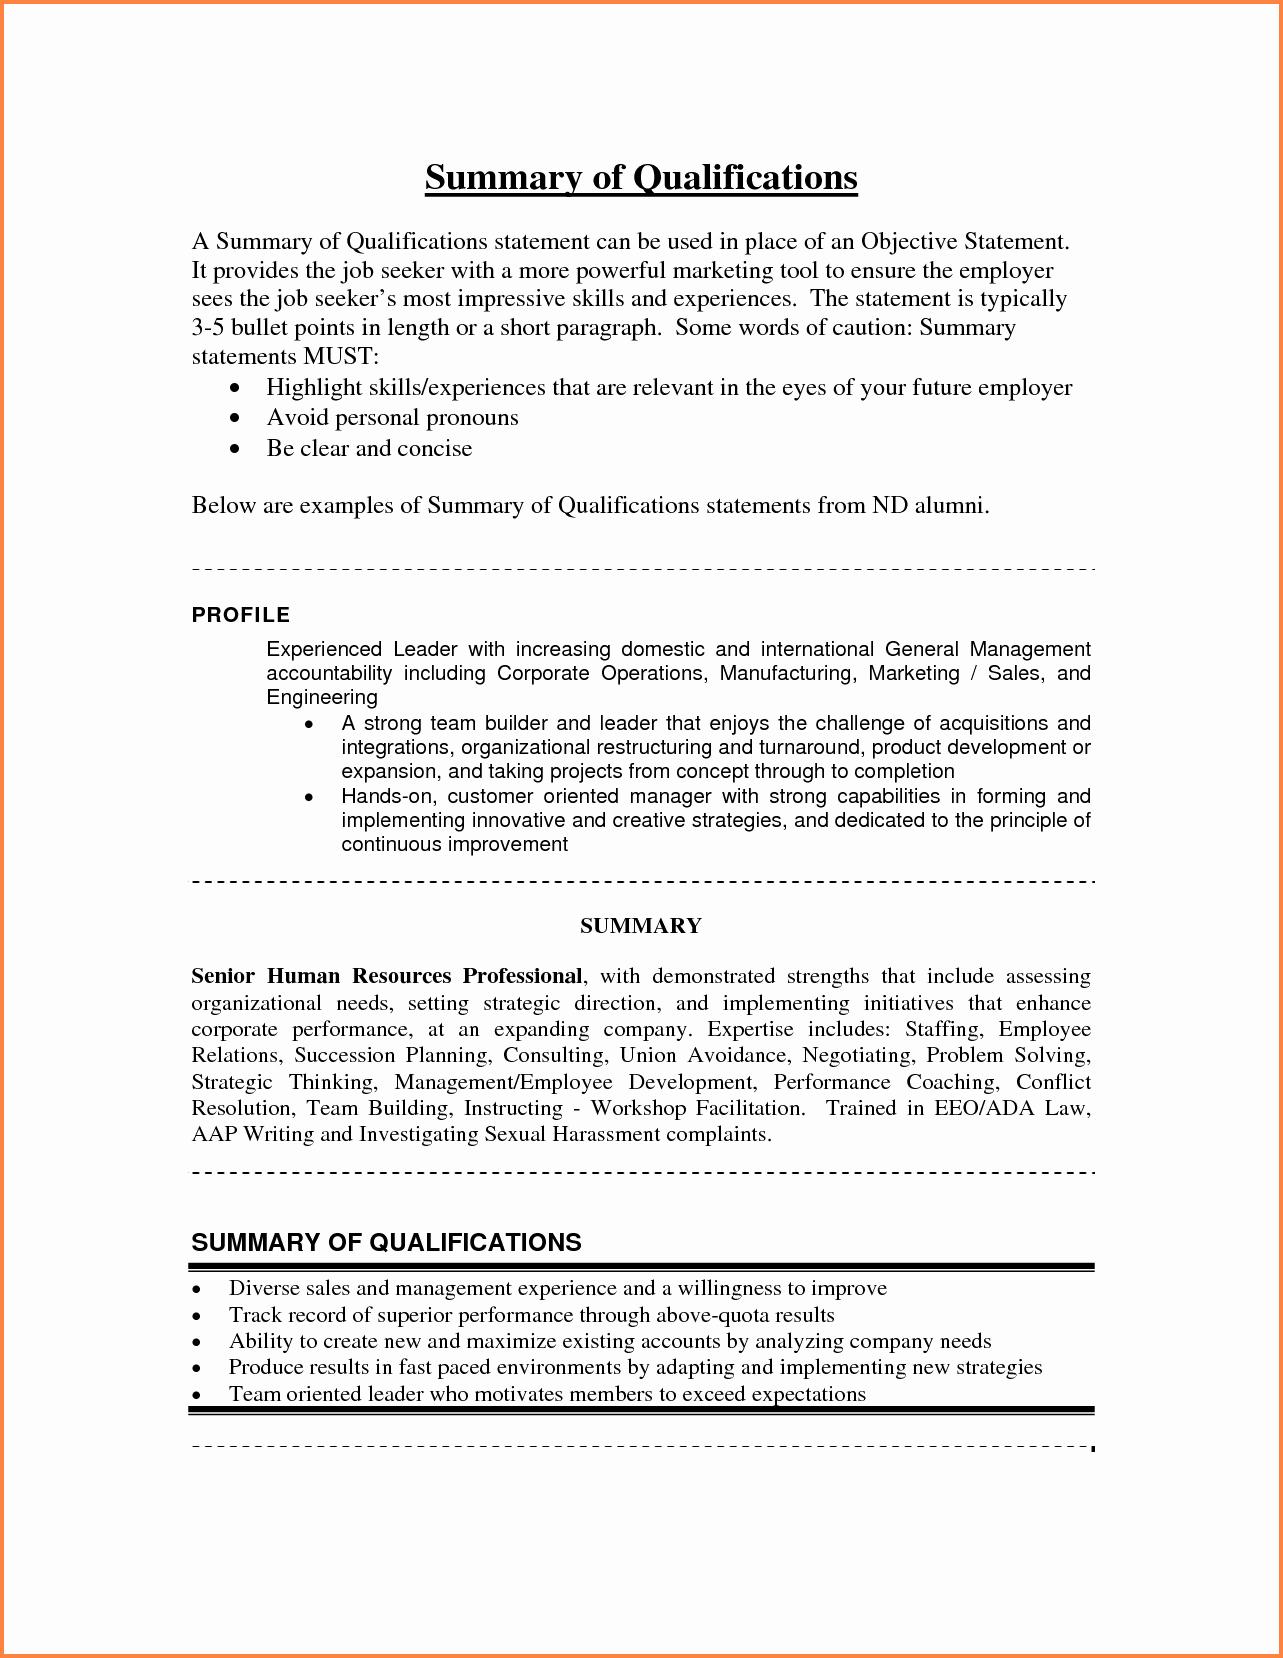 Sample Statement Of Qualification Inspirational 10 Statement Of Qualification